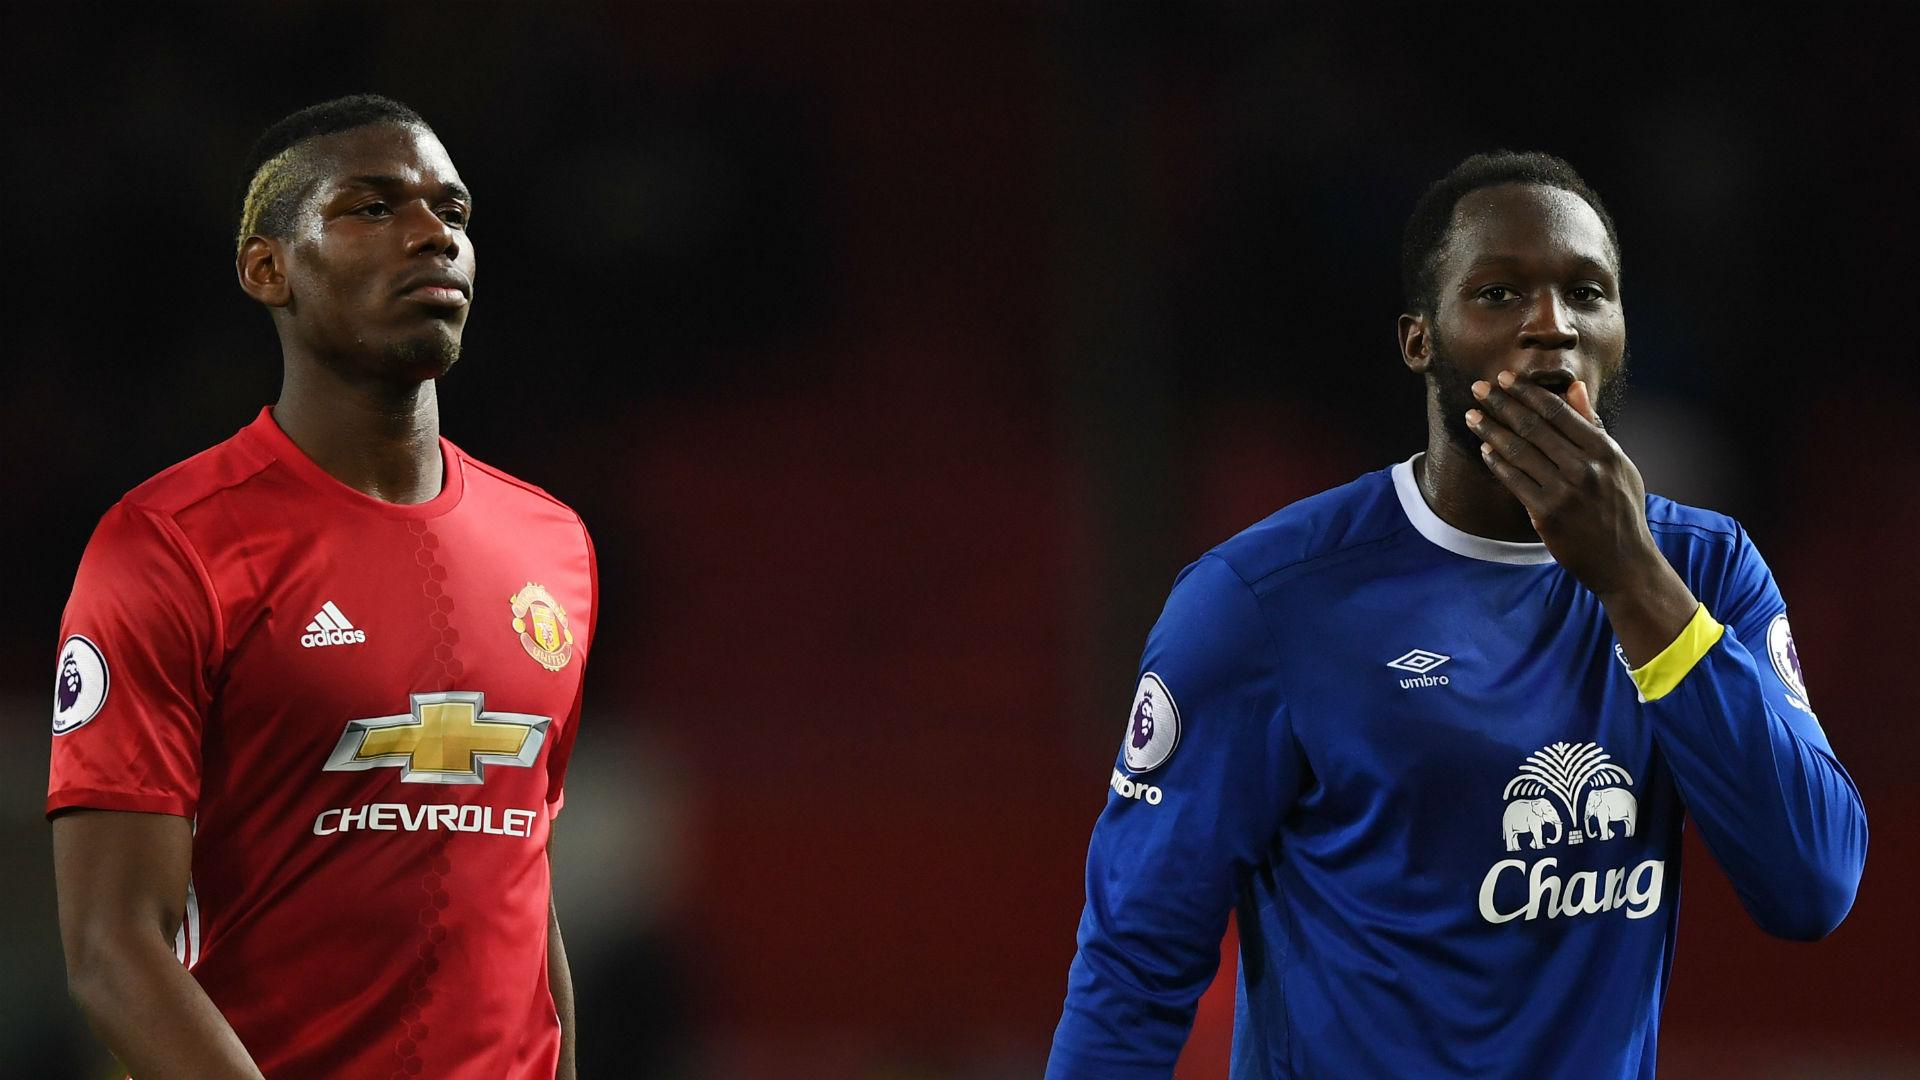 Paul Pogba Romelu Lukaku Manchester United Everton 04042017